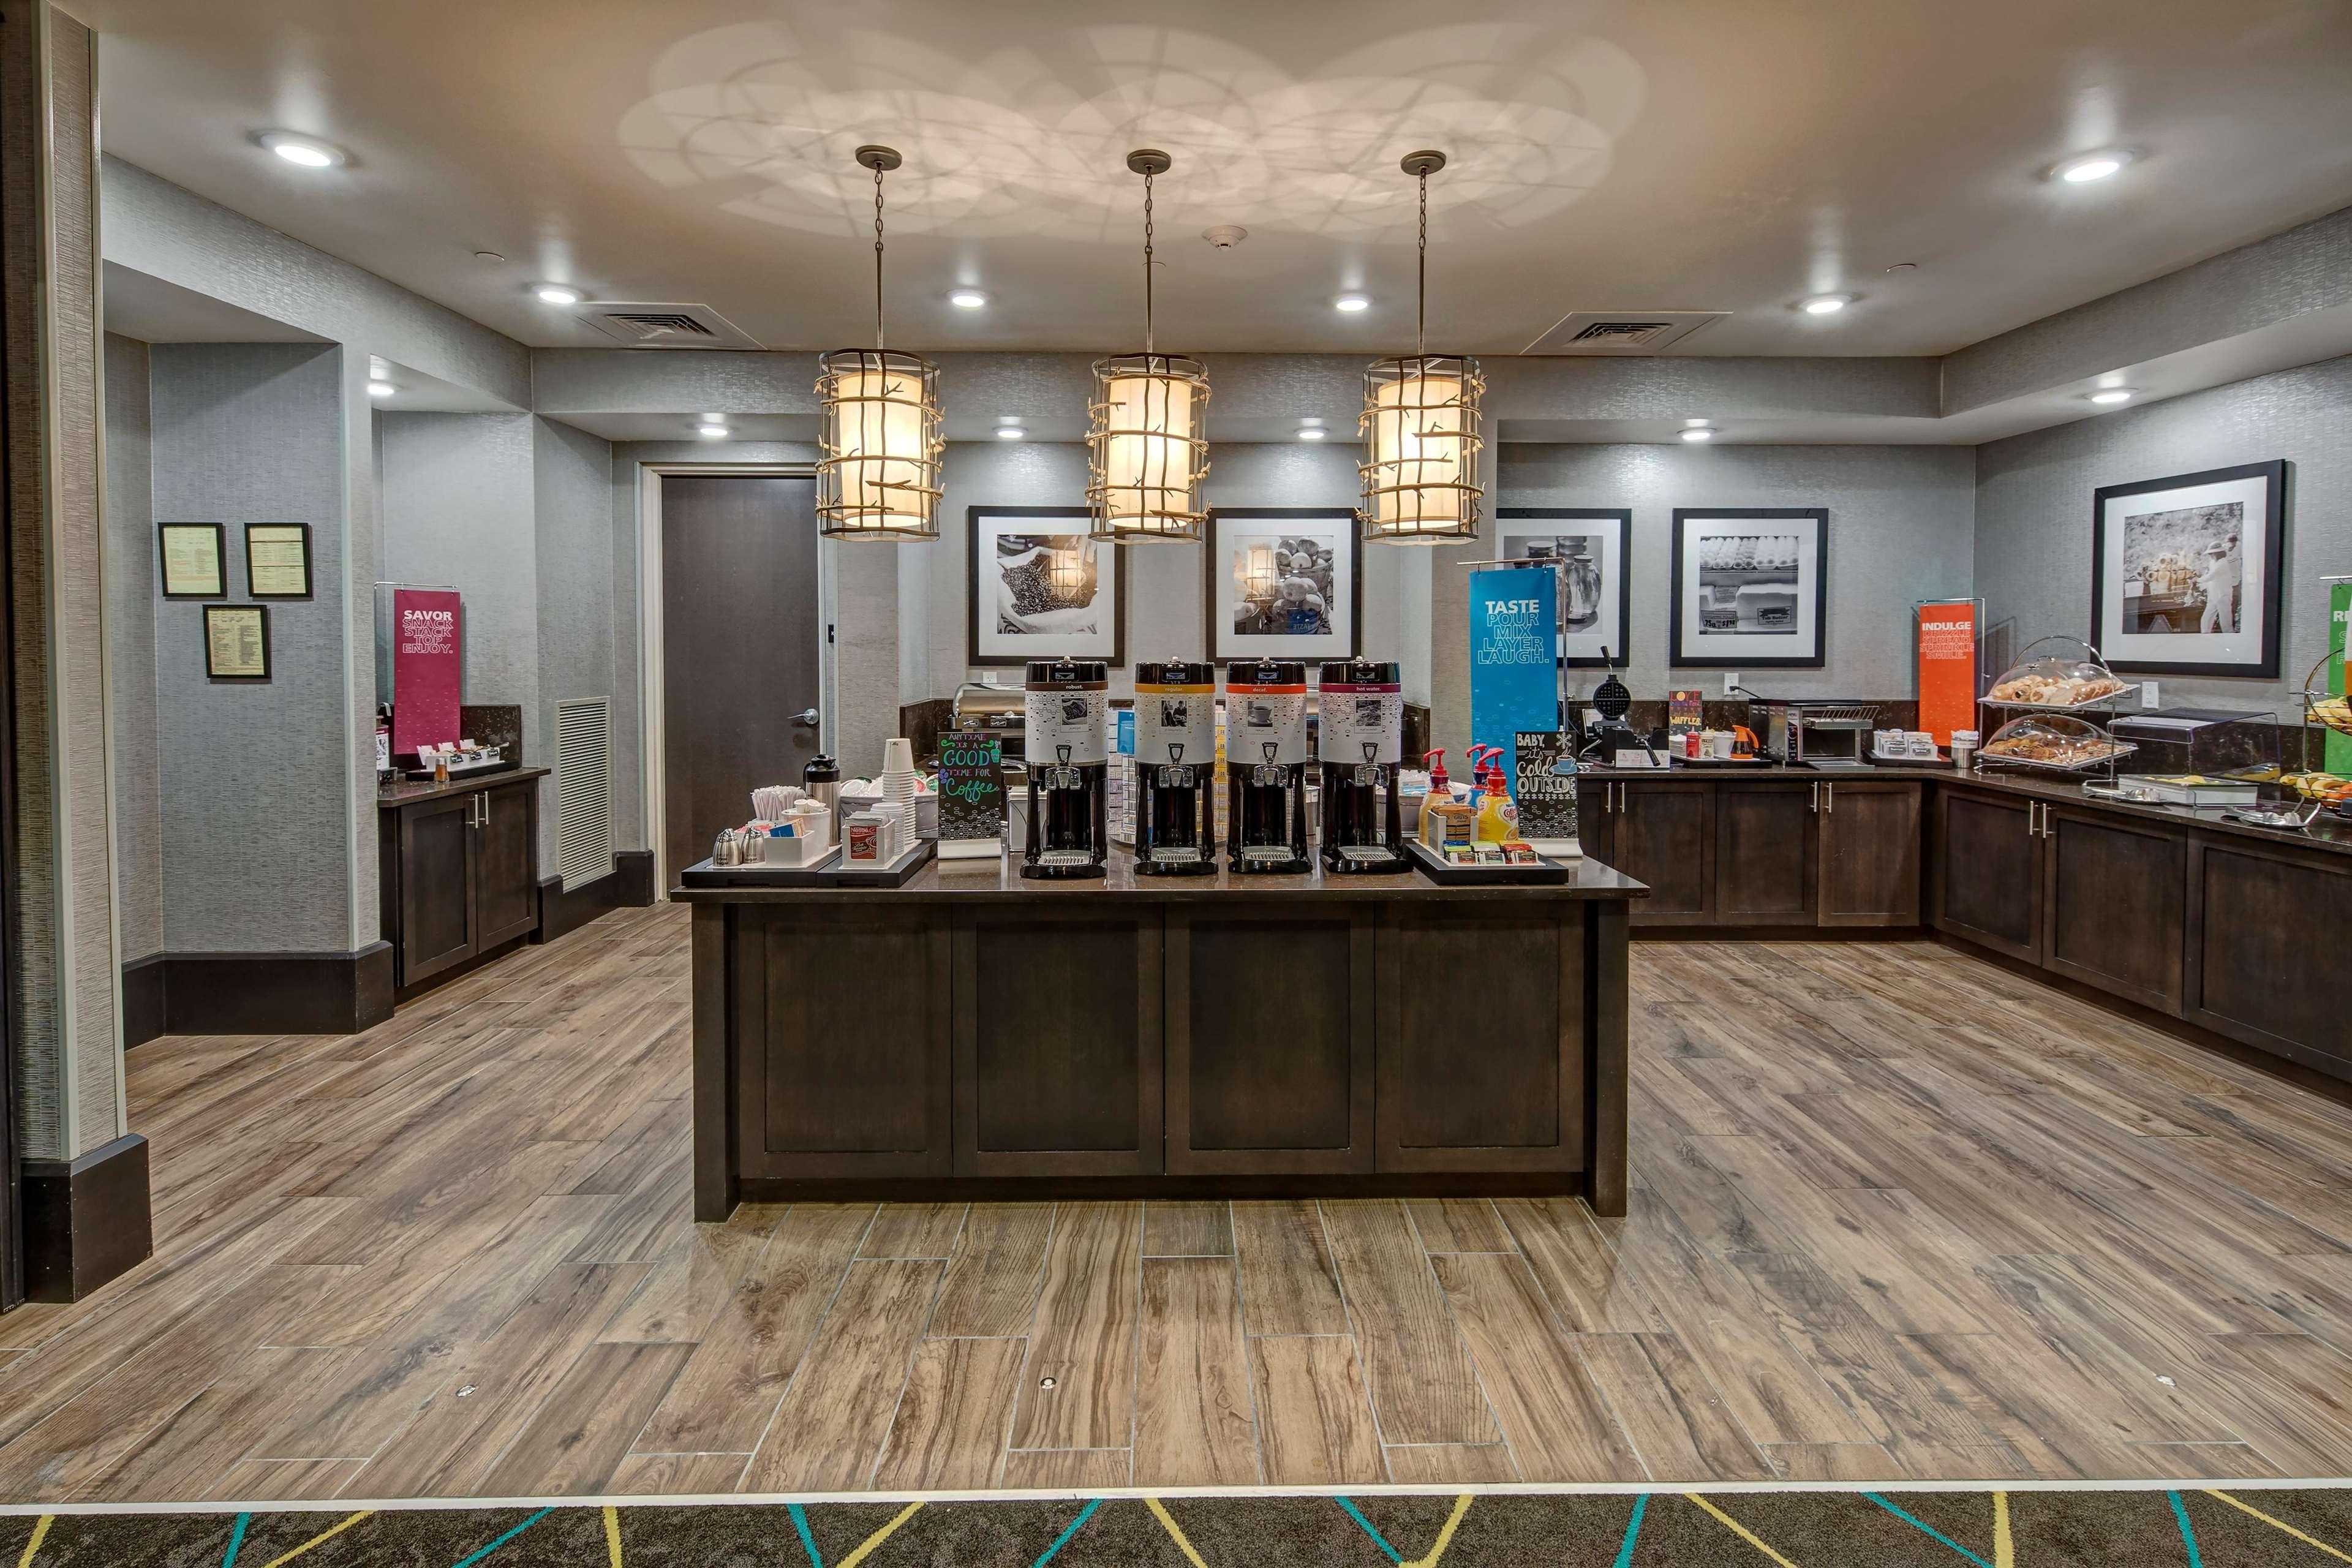 hampton inn suites nashville hendersonville in. Black Bedroom Furniture Sets. Home Design Ideas